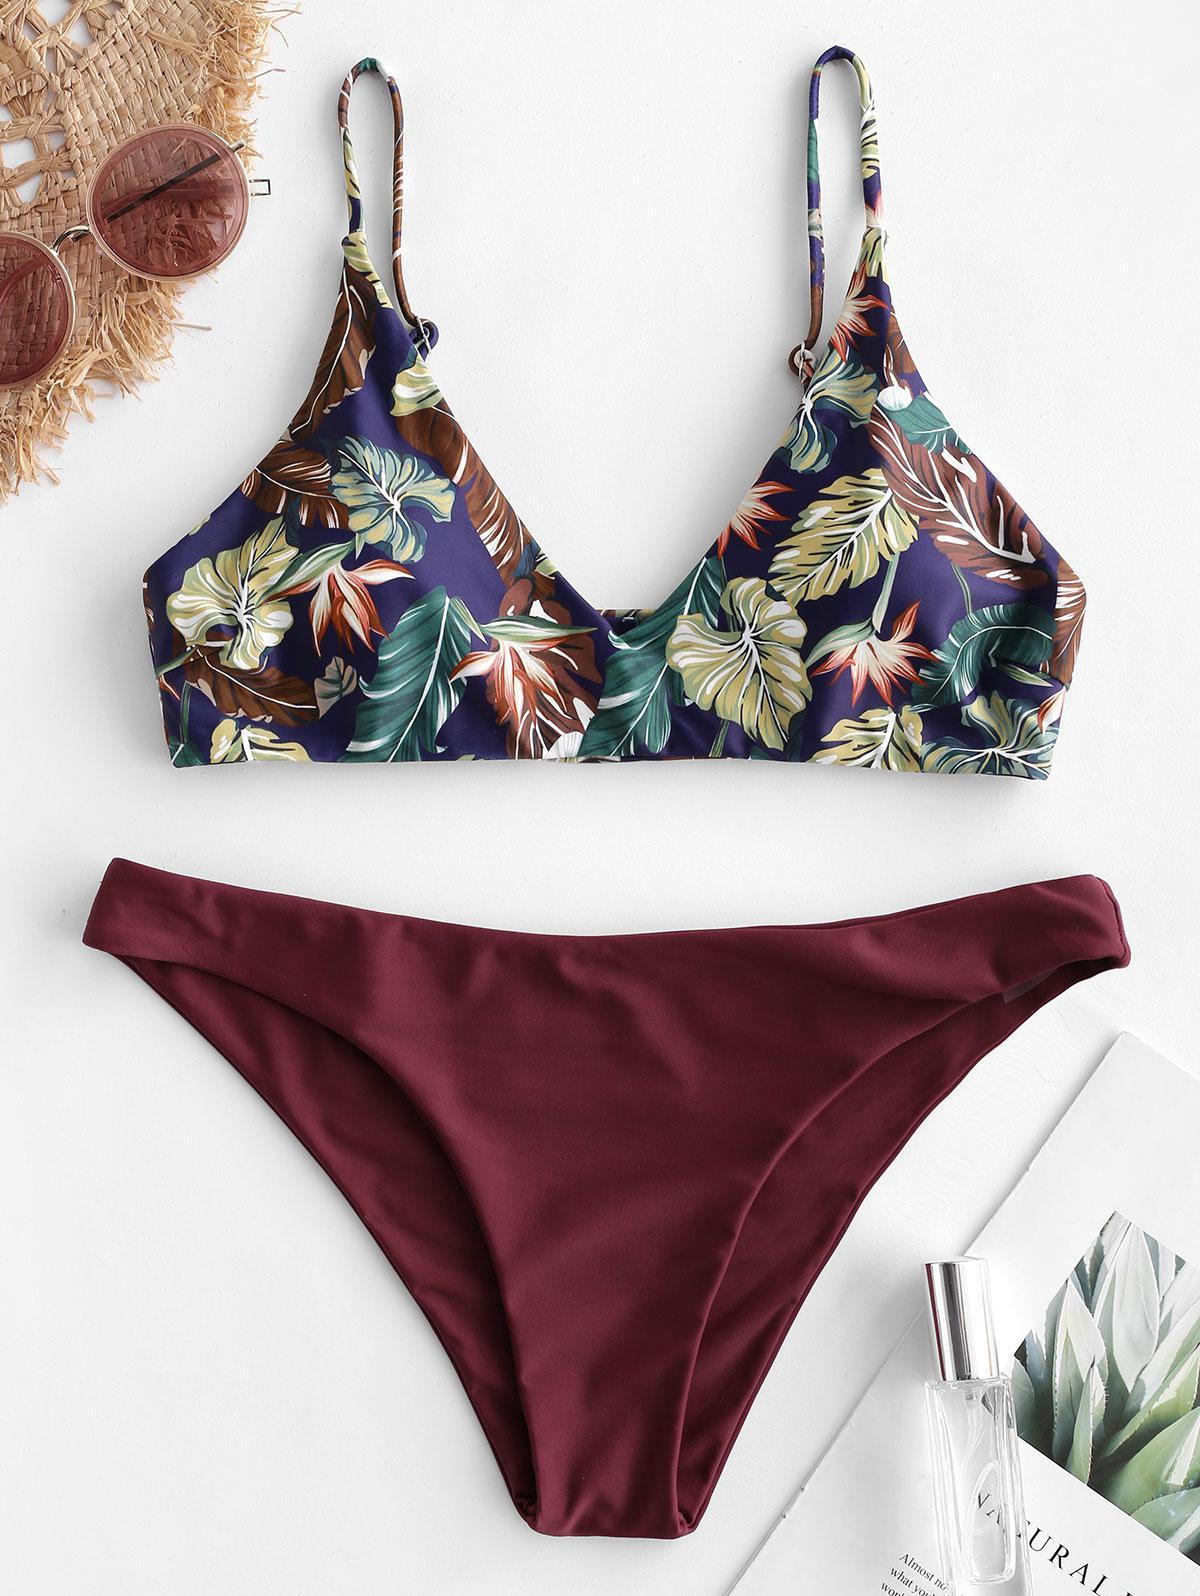 Zaful coupon: ZAFUL Tropical Leaf Bralette Bikini Swimsuit